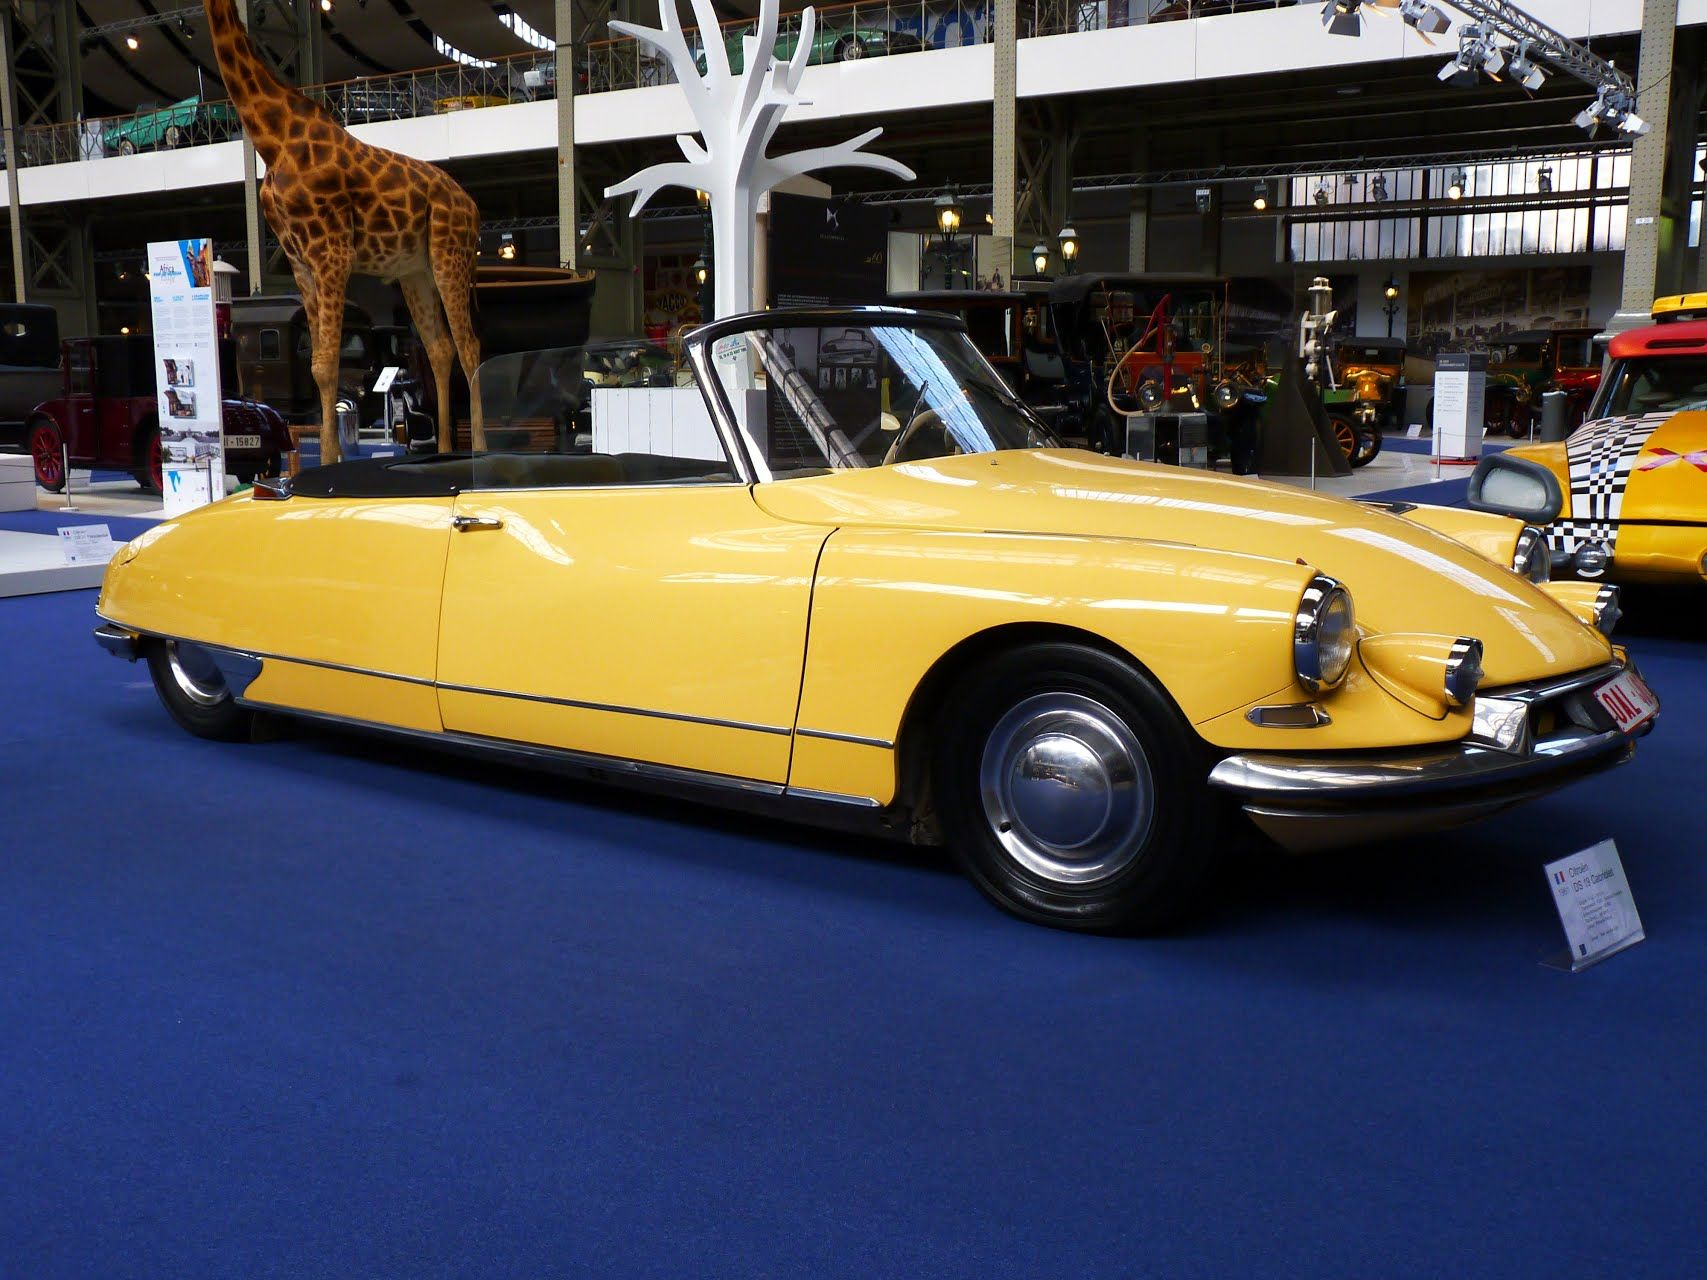 citro n ds 19 cabriolet 1961 citro n pinterest citroen ds. Black Bedroom Furniture Sets. Home Design Ideas